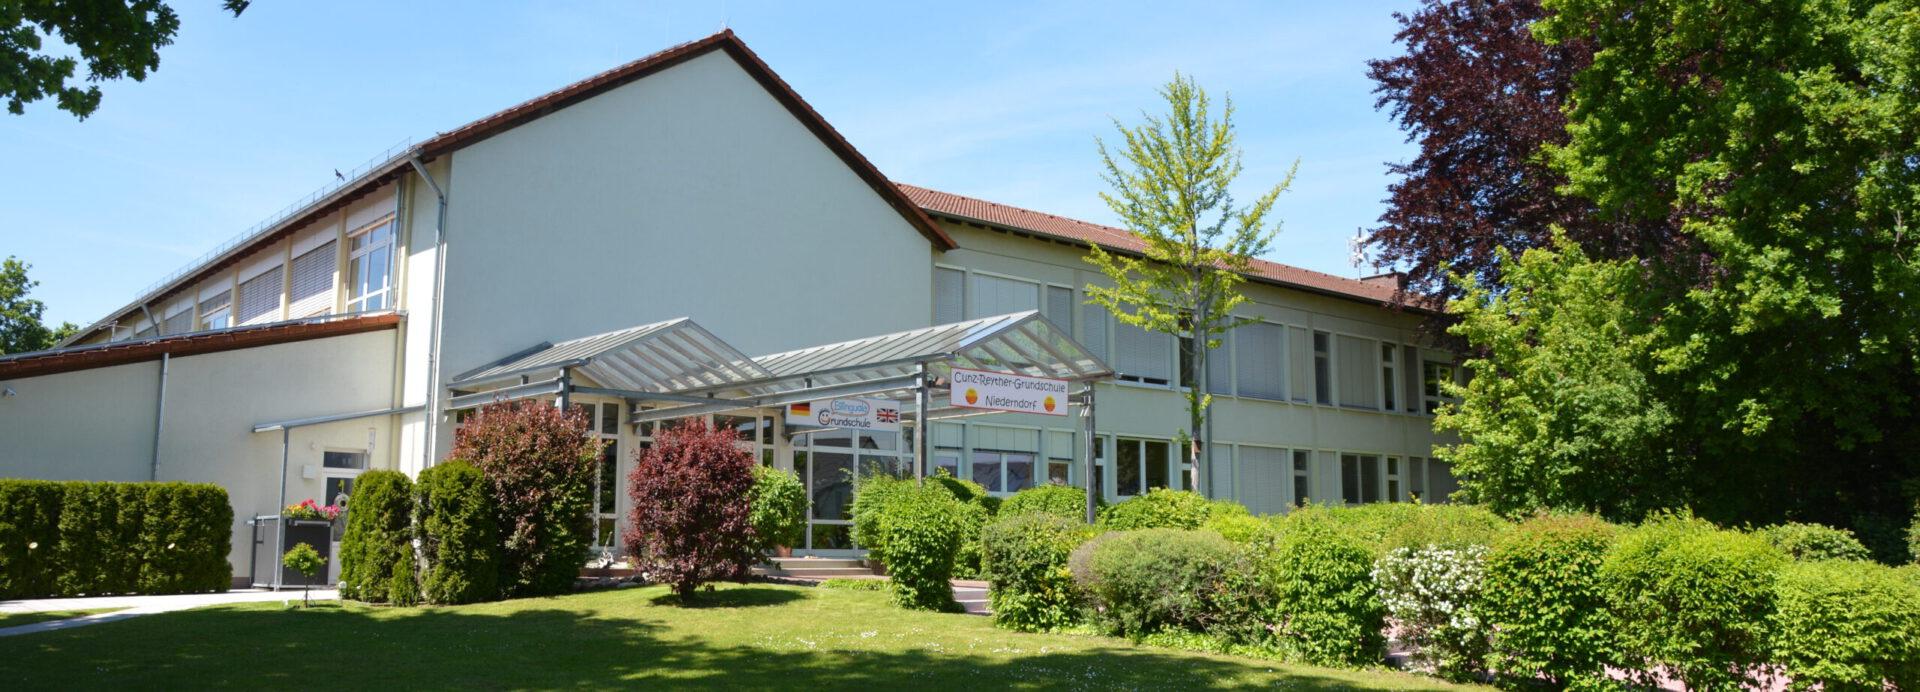 Cunz-Reyther-Grundschule